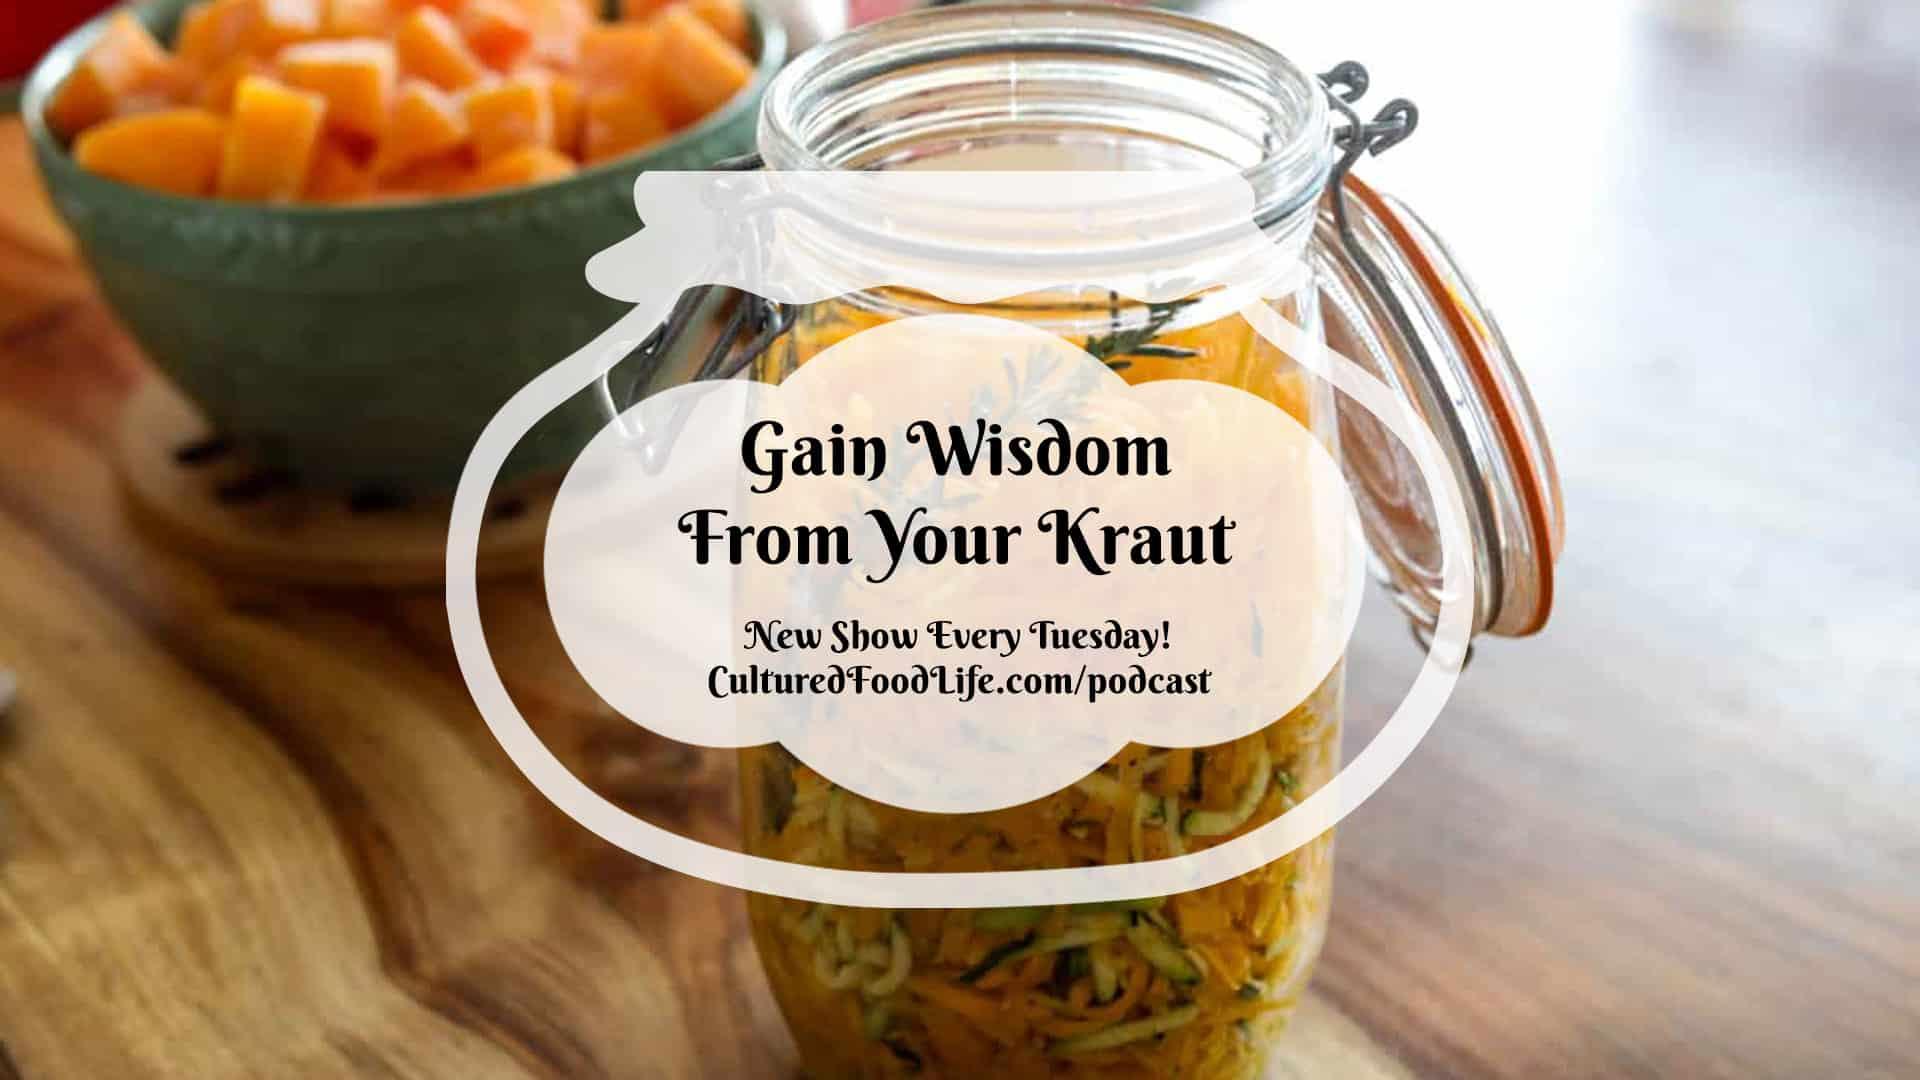 Gain Wisdom From Your Kraut